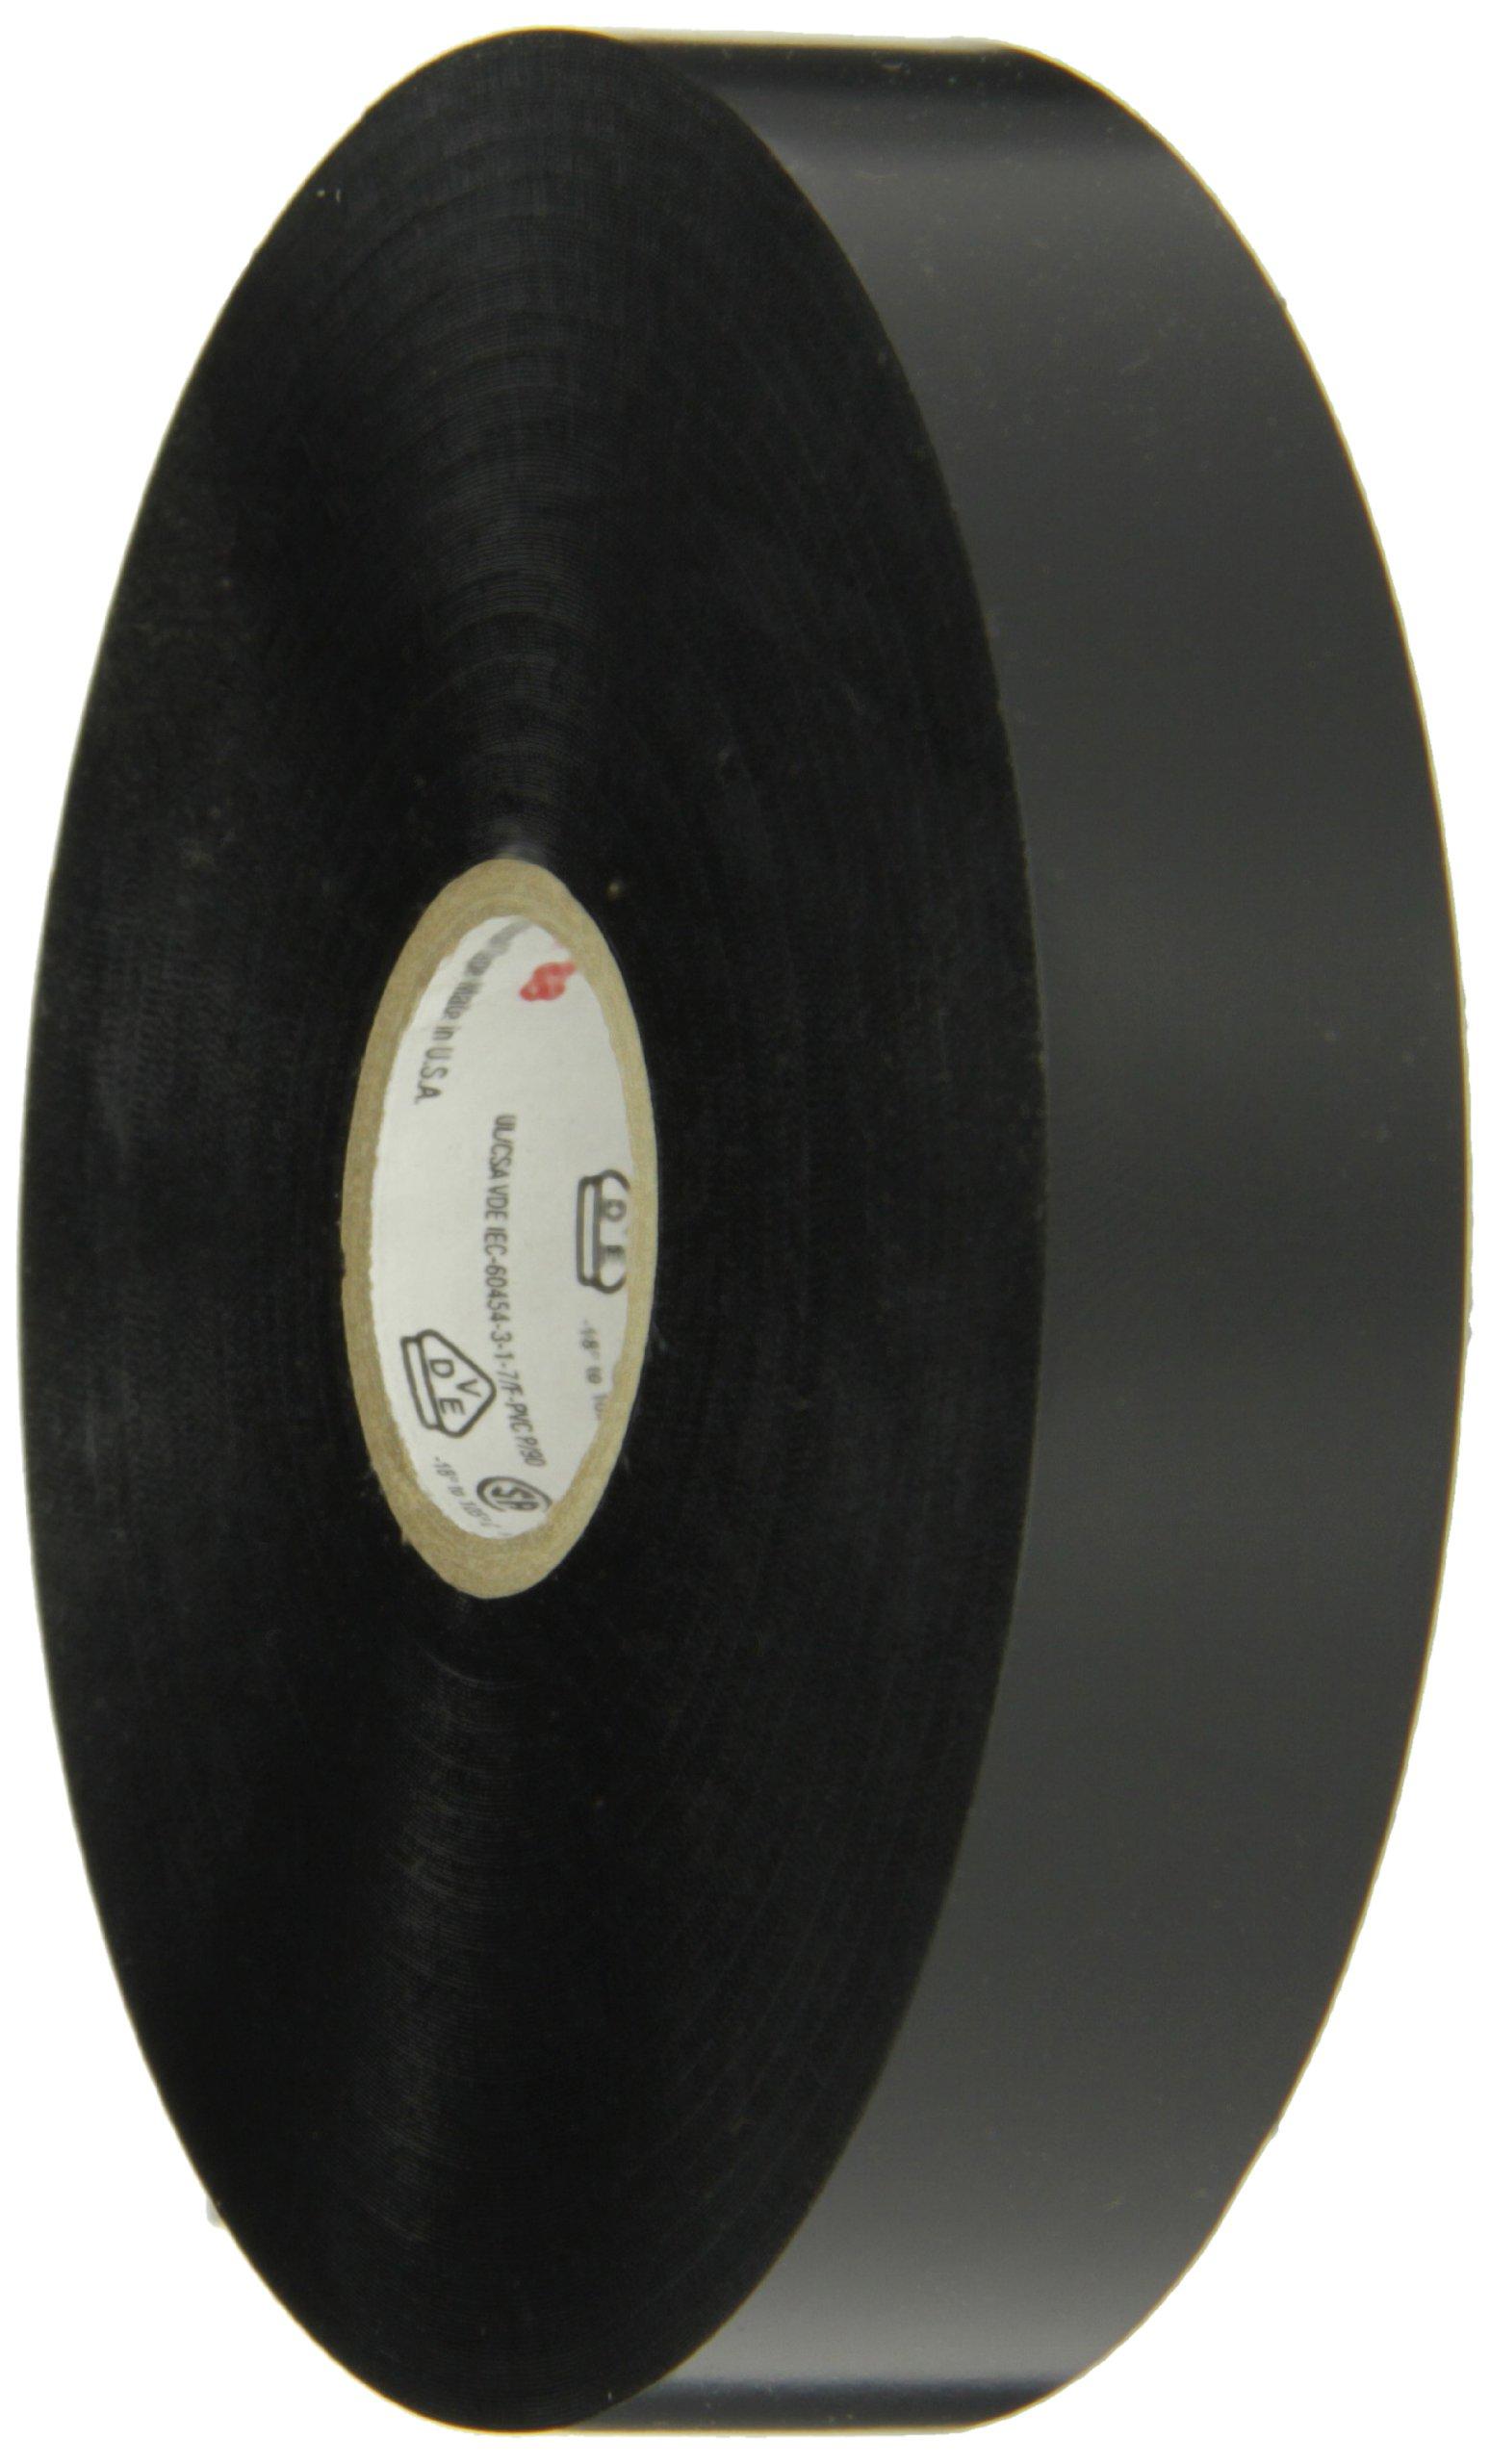 Scotch Vinyl Electrical Tape Super 88, 3/4 in x 36 yds, Black, 12 rolls/carton, 48 rolls/case